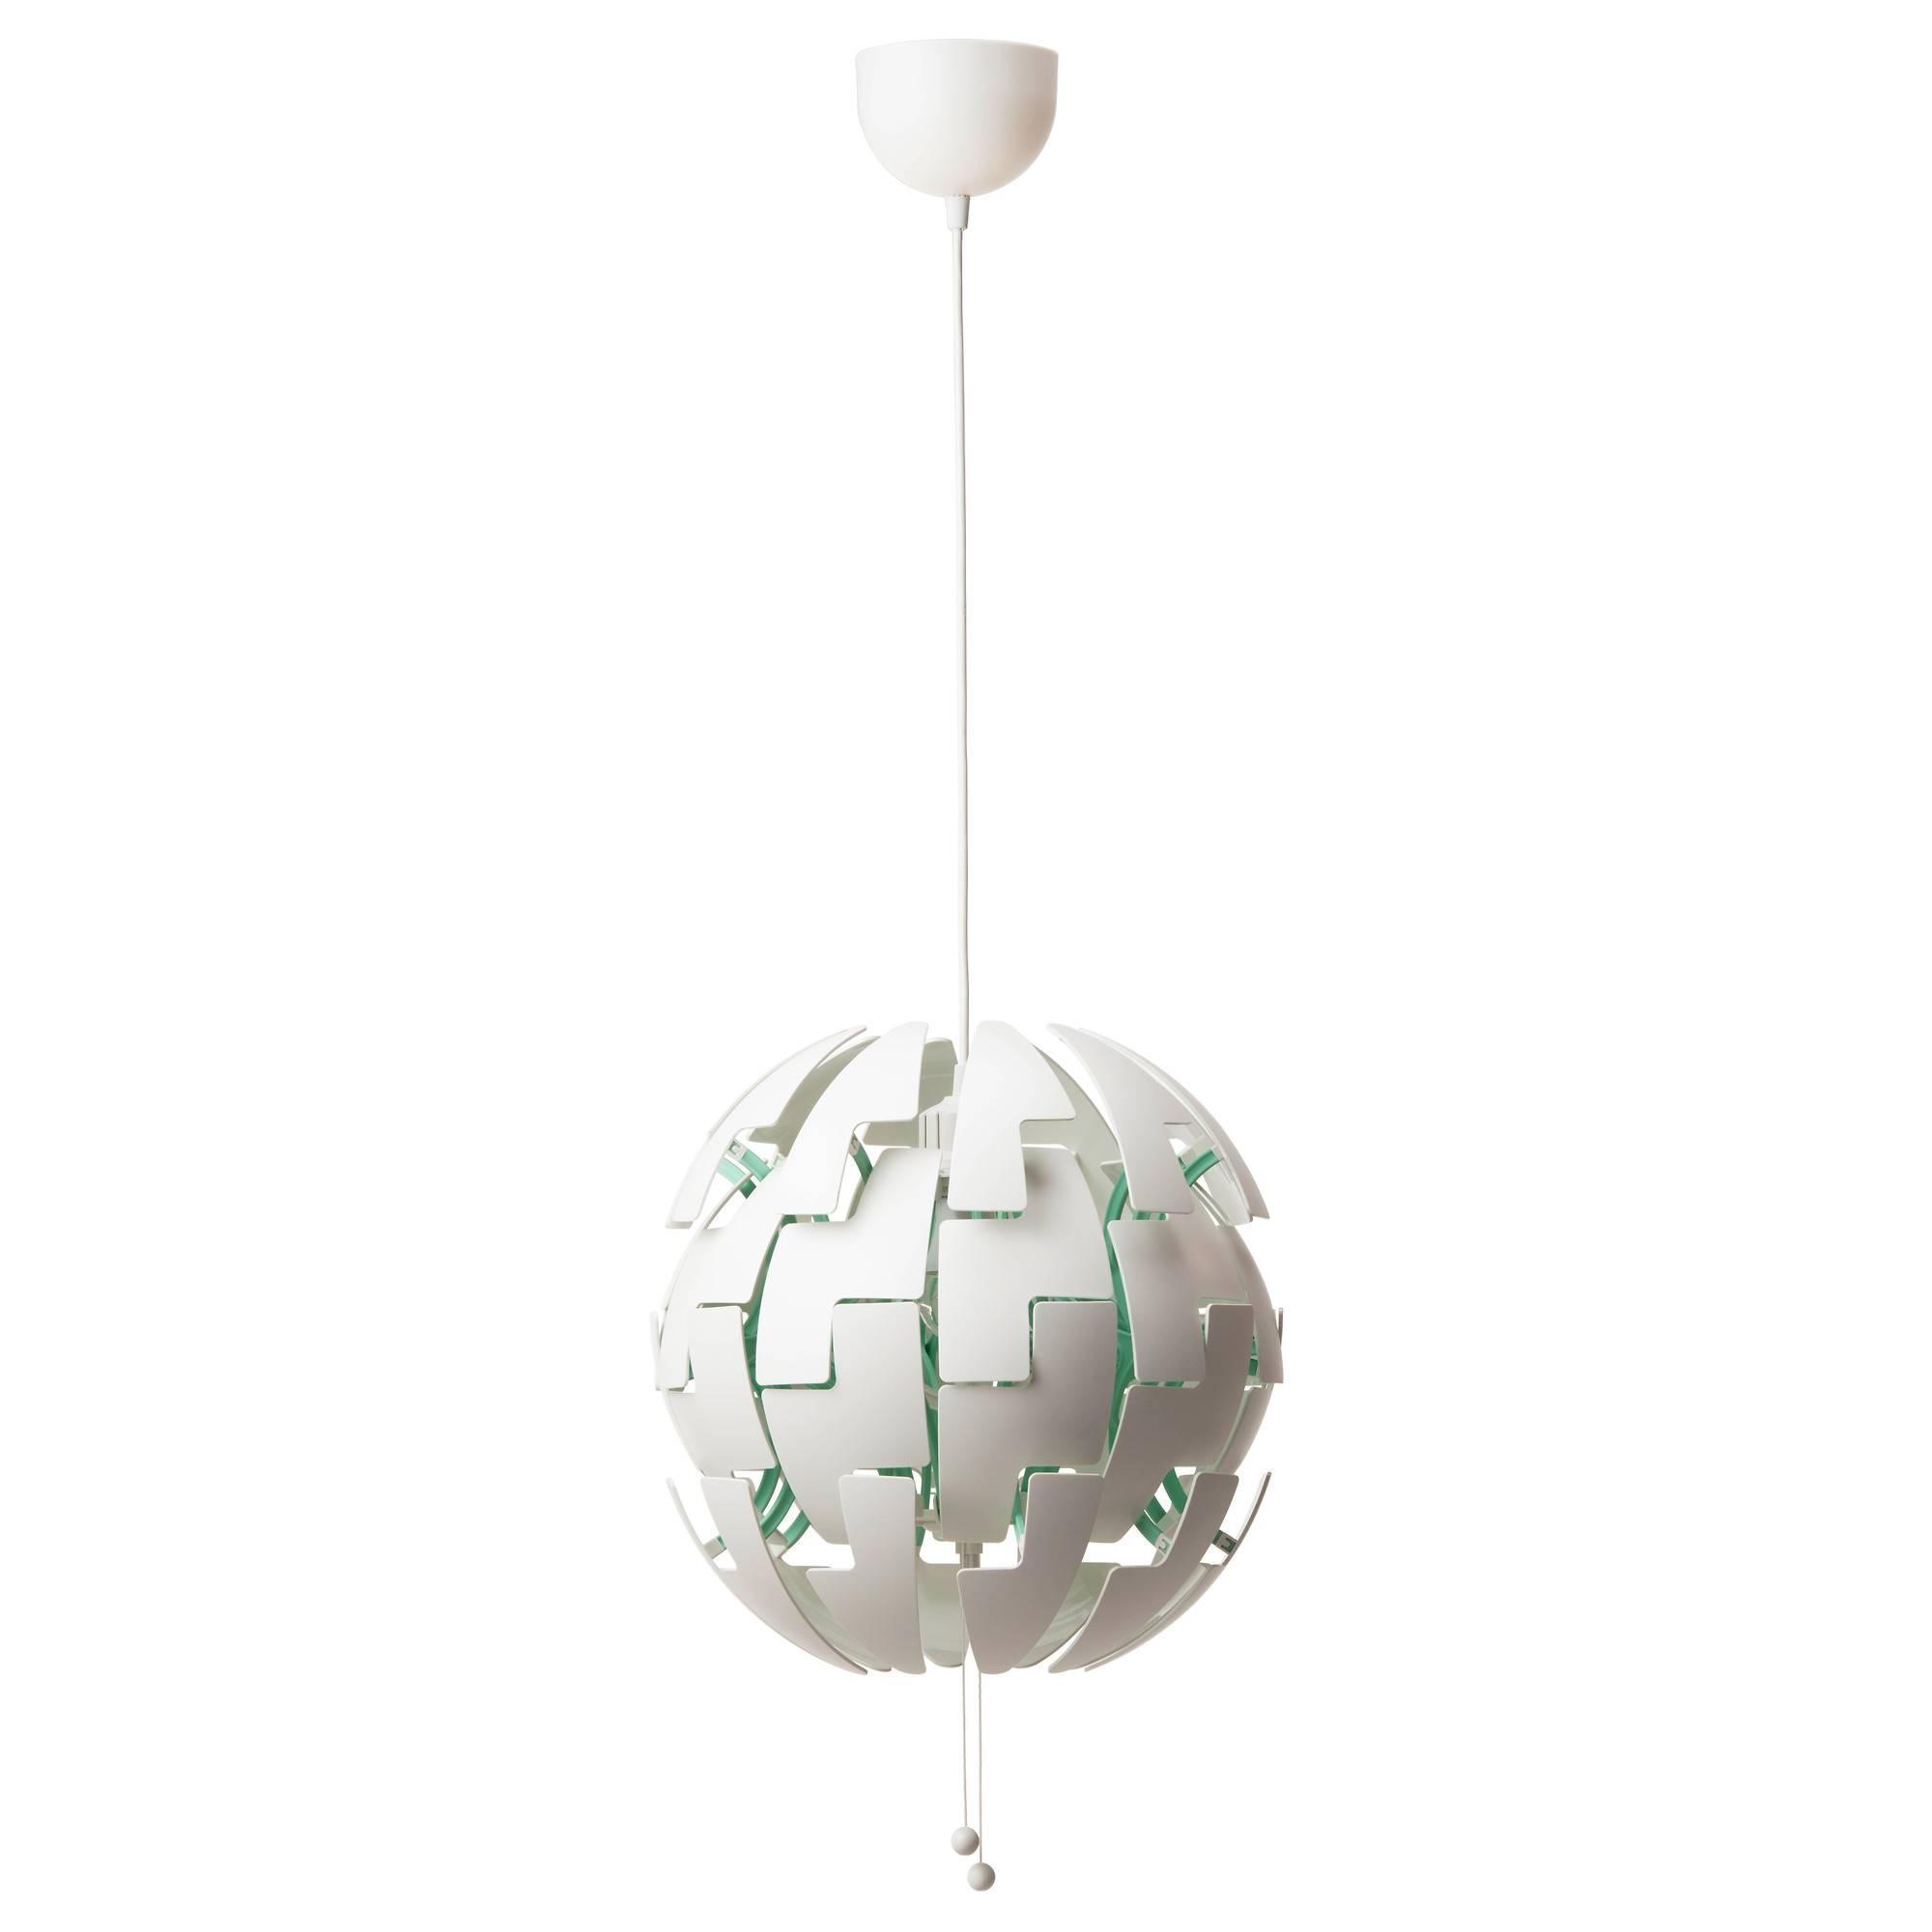 Ikea Ps 2014 Pendant Lamp   White/orange   Ikea In Ikea Globe Pendant Lights (Photo 9 of 15)